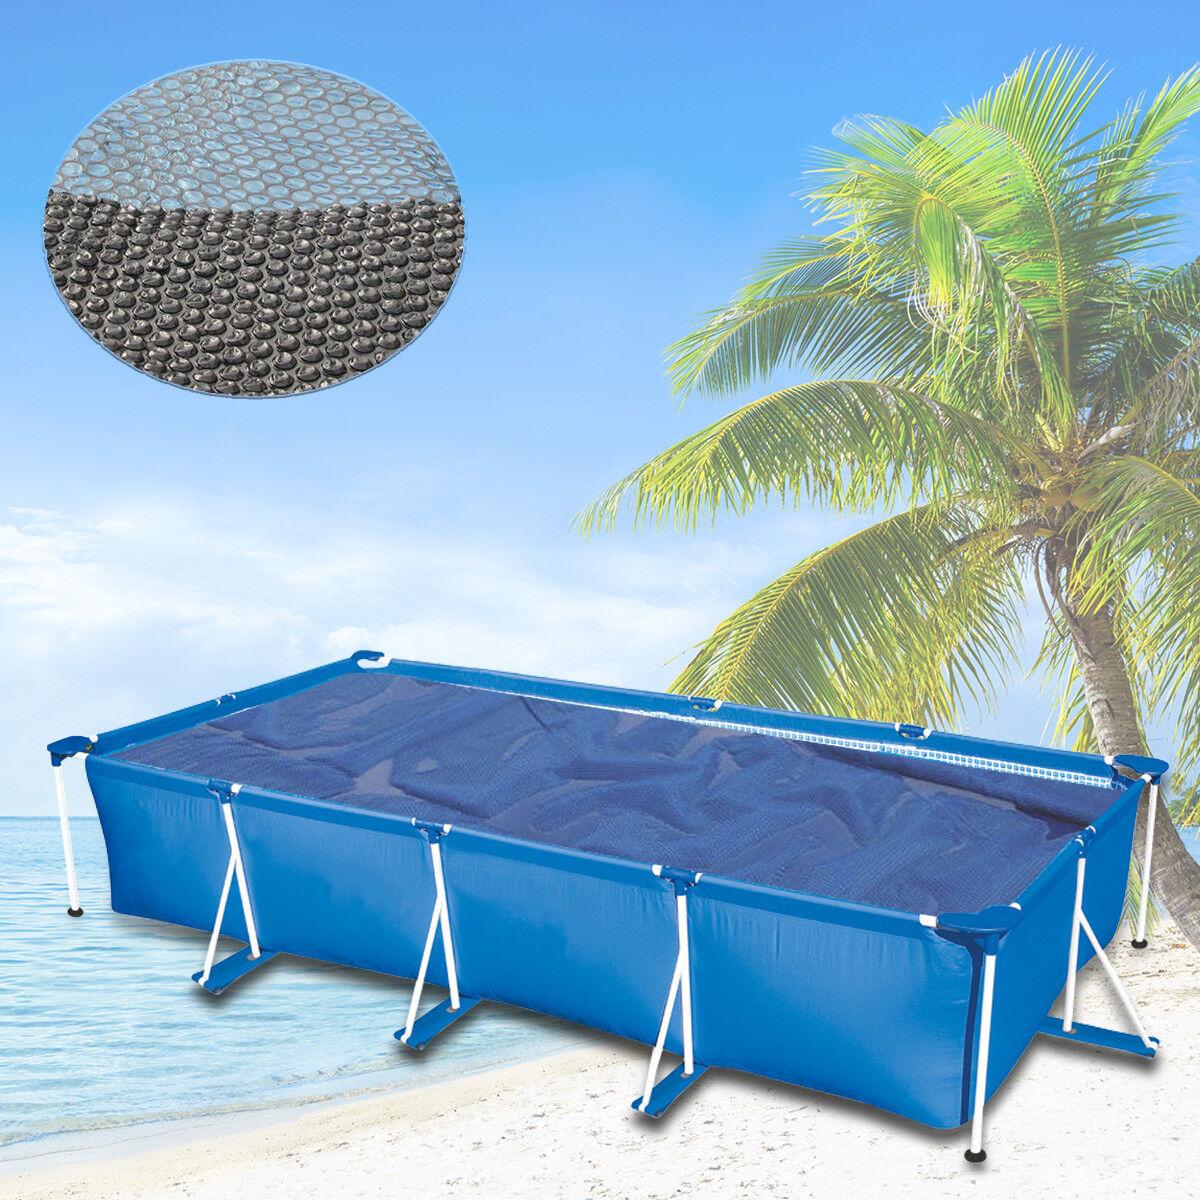 260x160 Warmeplane Solarfolie Solarplane Solarheizung Schwarz Blau Pool Heizung Ebay